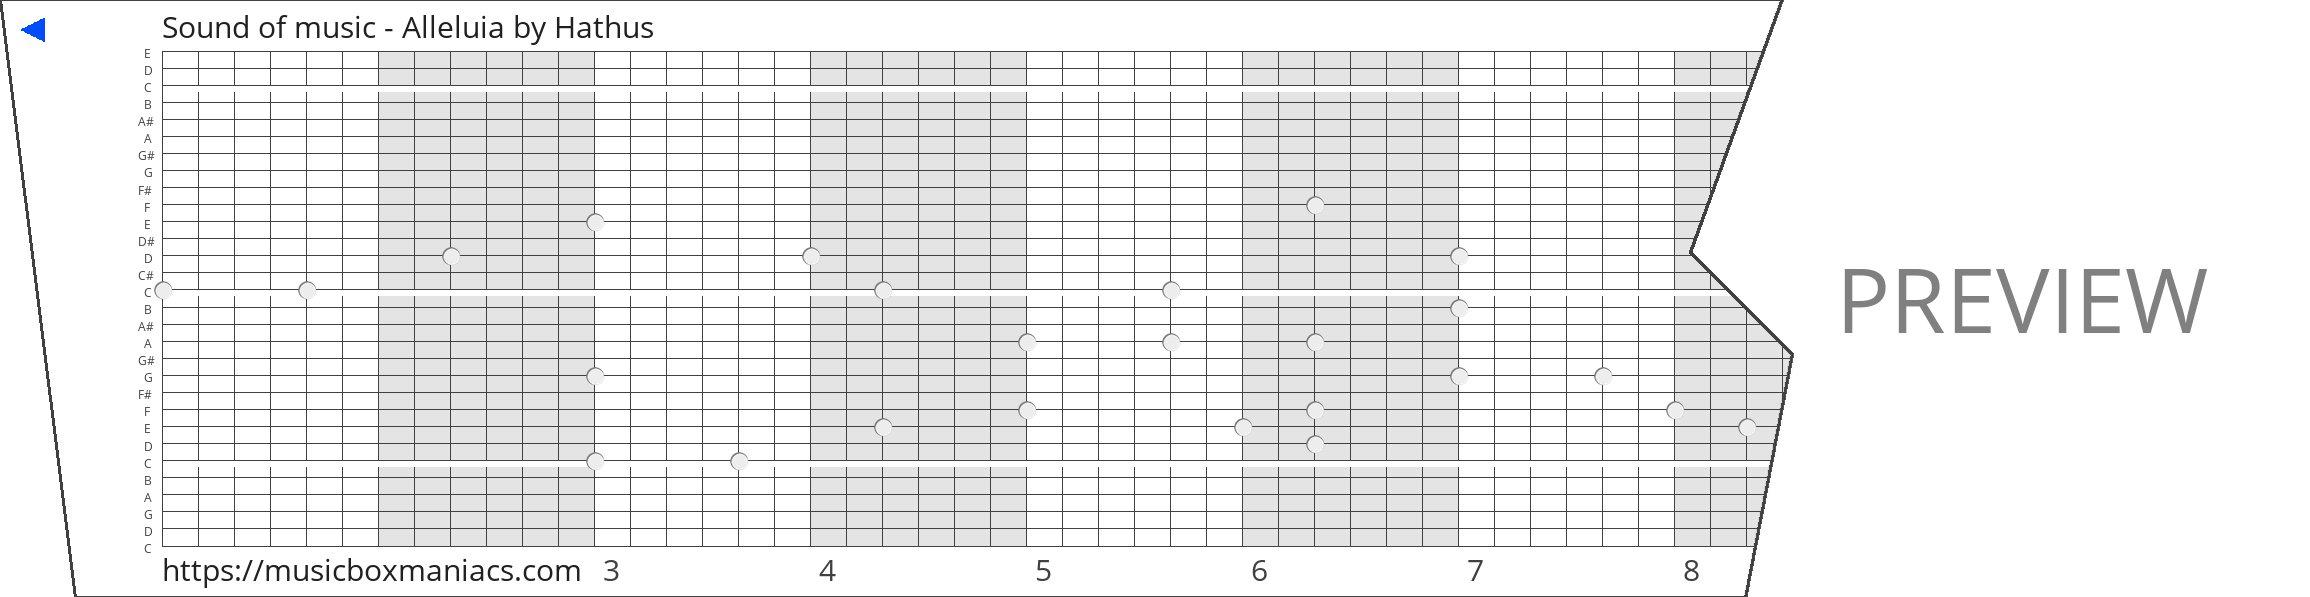 Sound of music - Alleluia 30 note music box paper strip